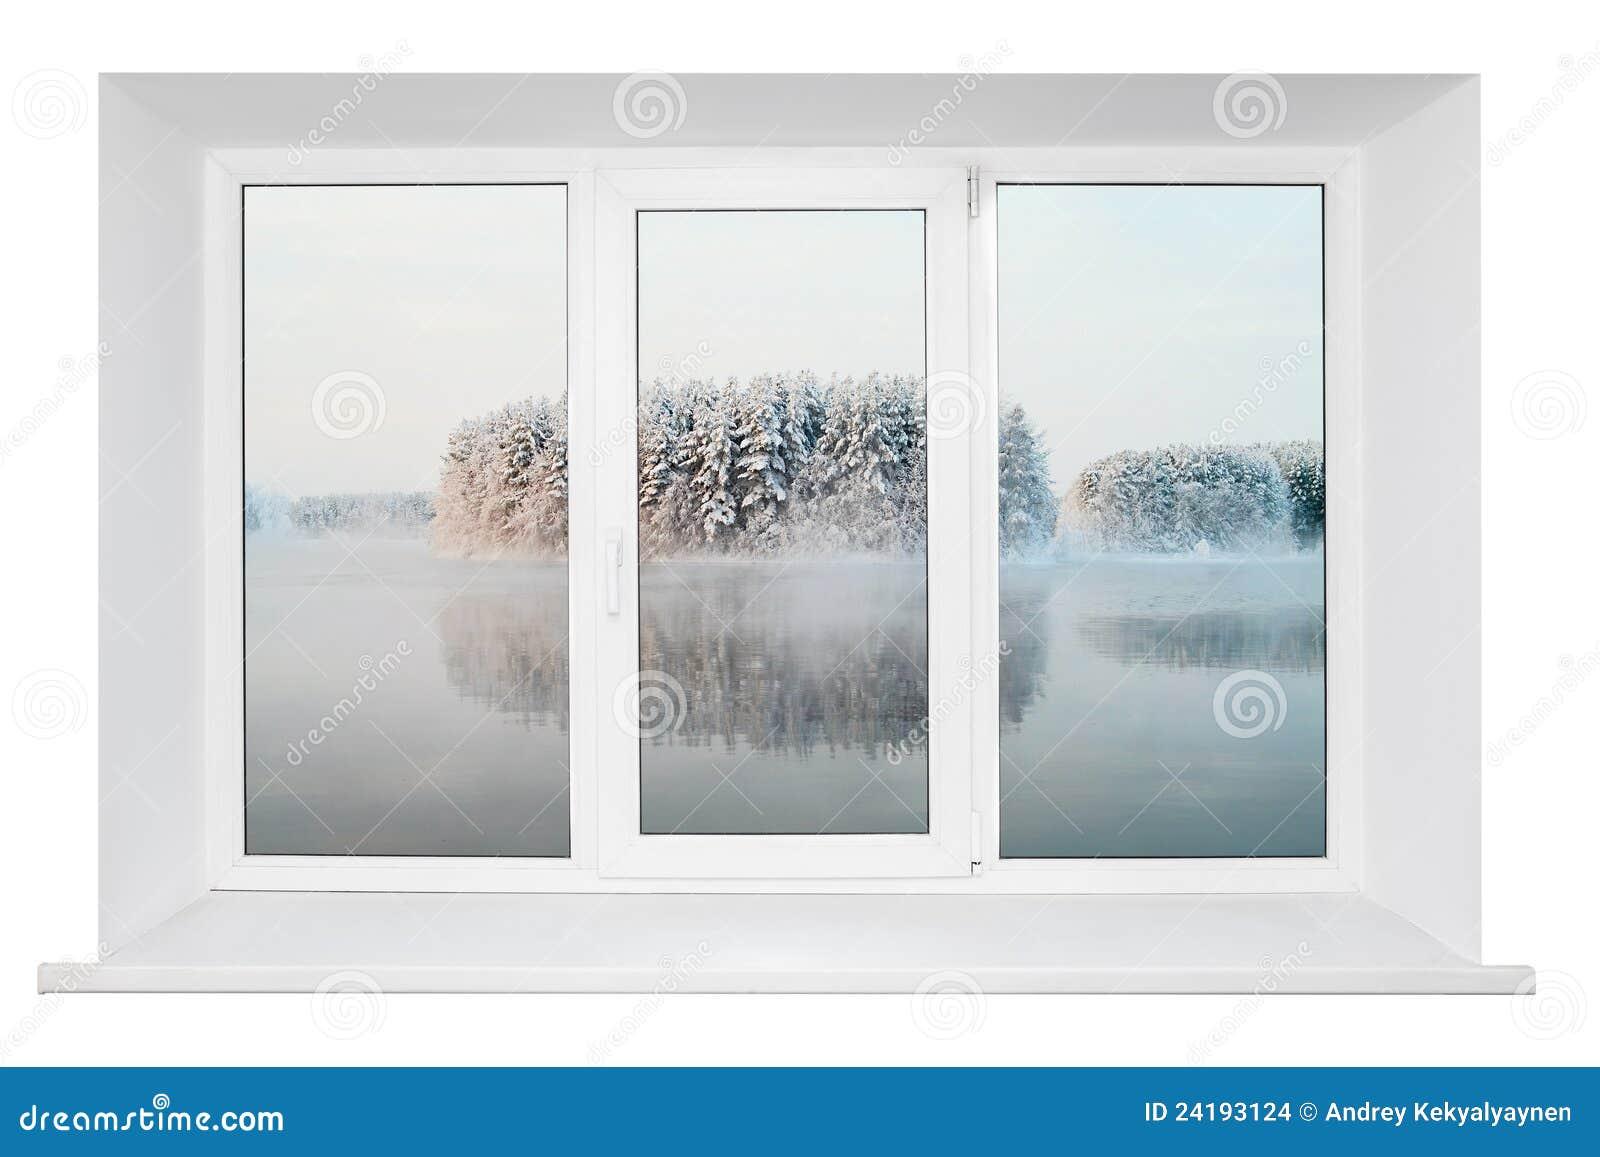 Снято через окно 24 фотография